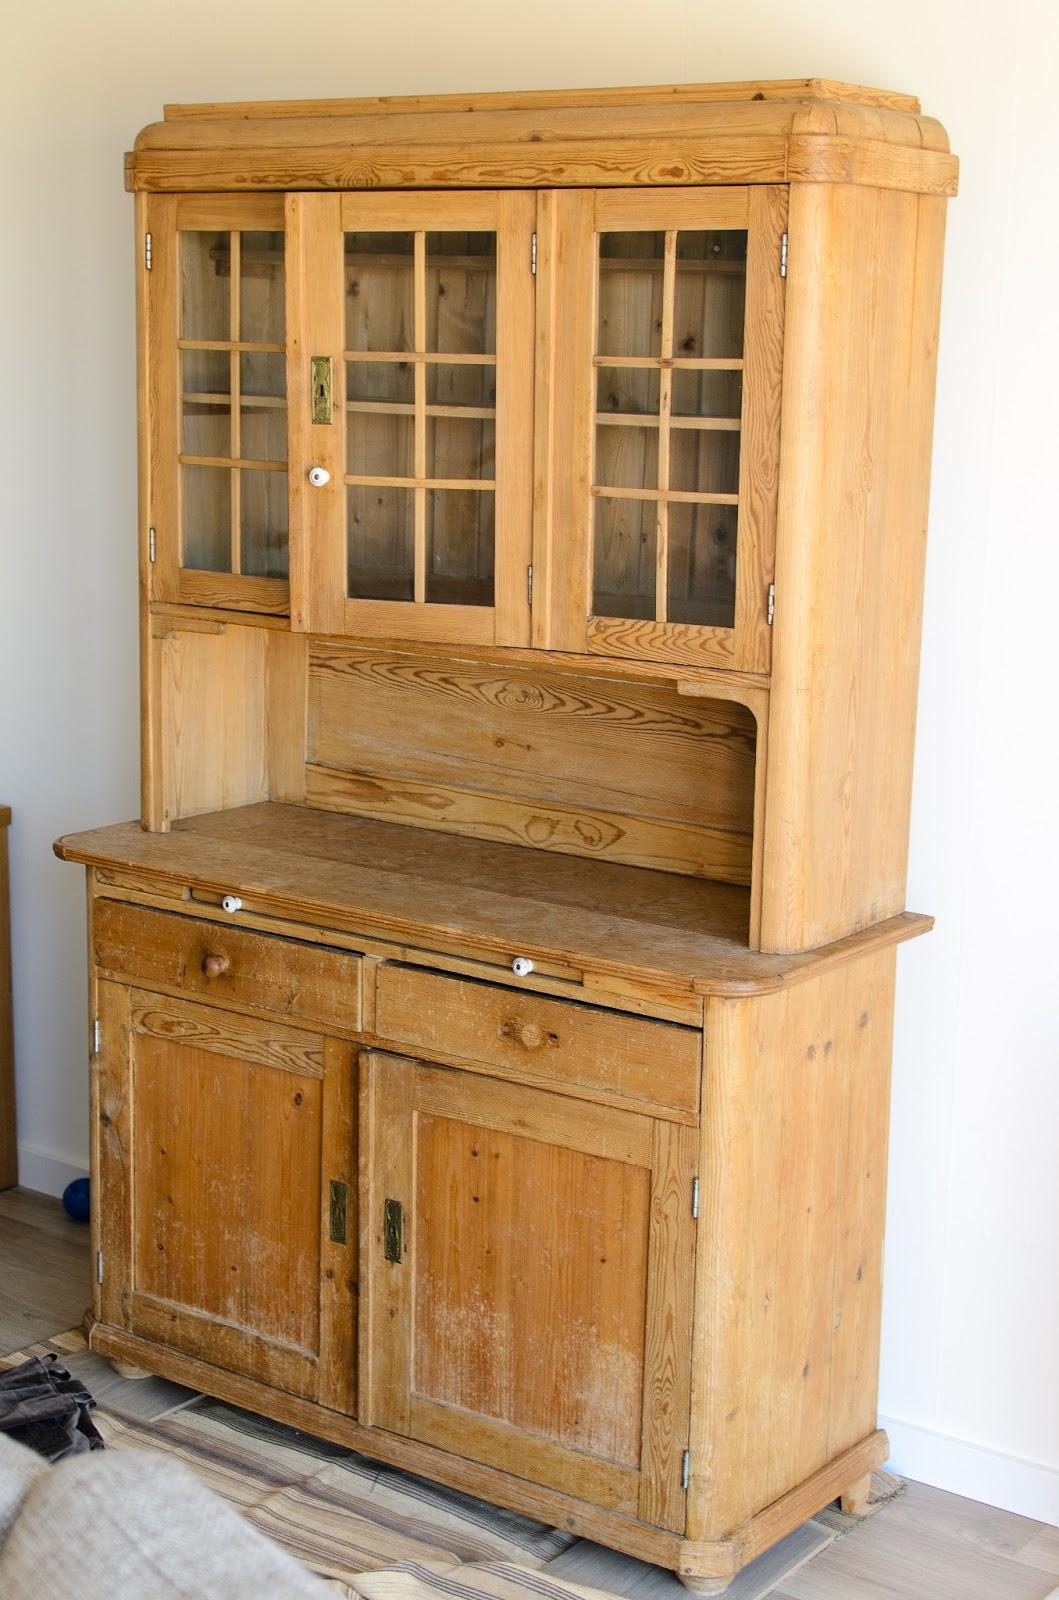 Eiken Keuken Schilderen Forum : Pvblik com Groen Idee Keukenkast